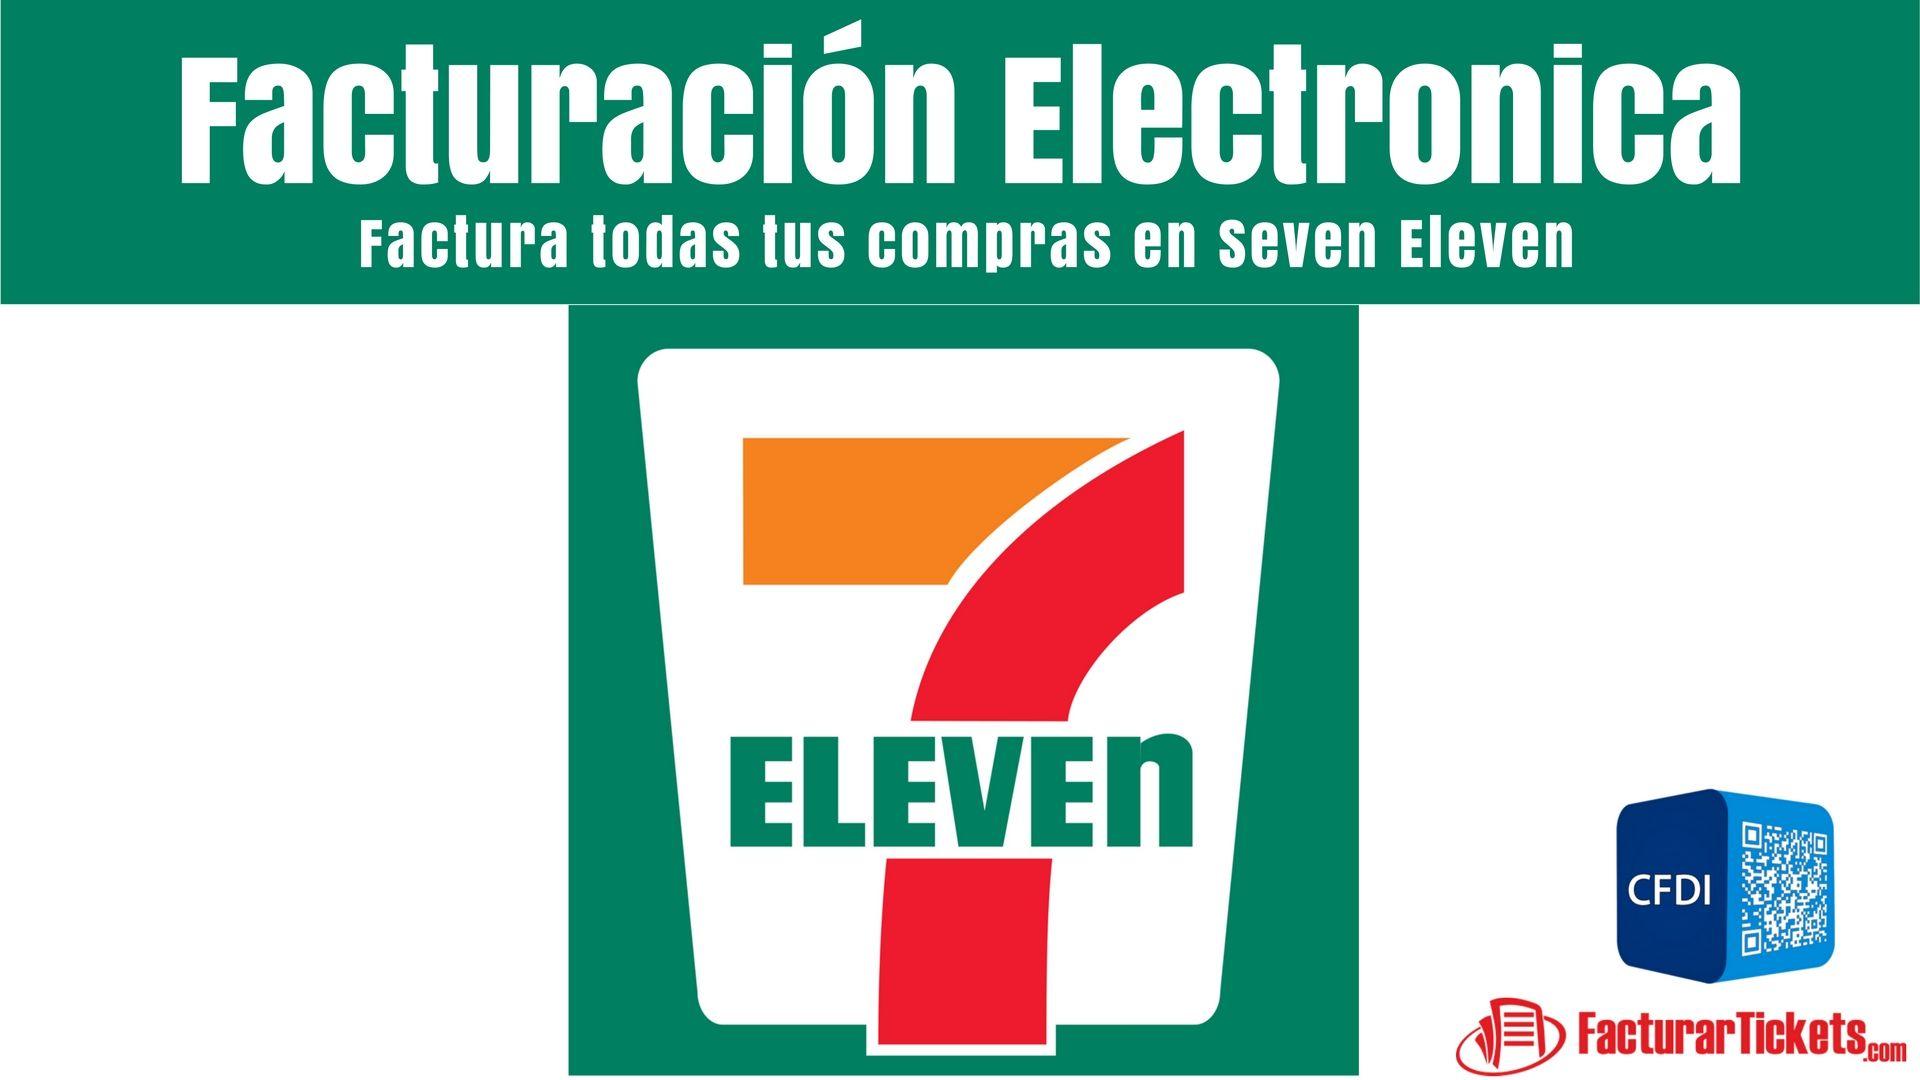 7 eleven facturacion electronica en linea facturacion electronica 7 eleven facturacion electronica en linea fandeluxe Gallery